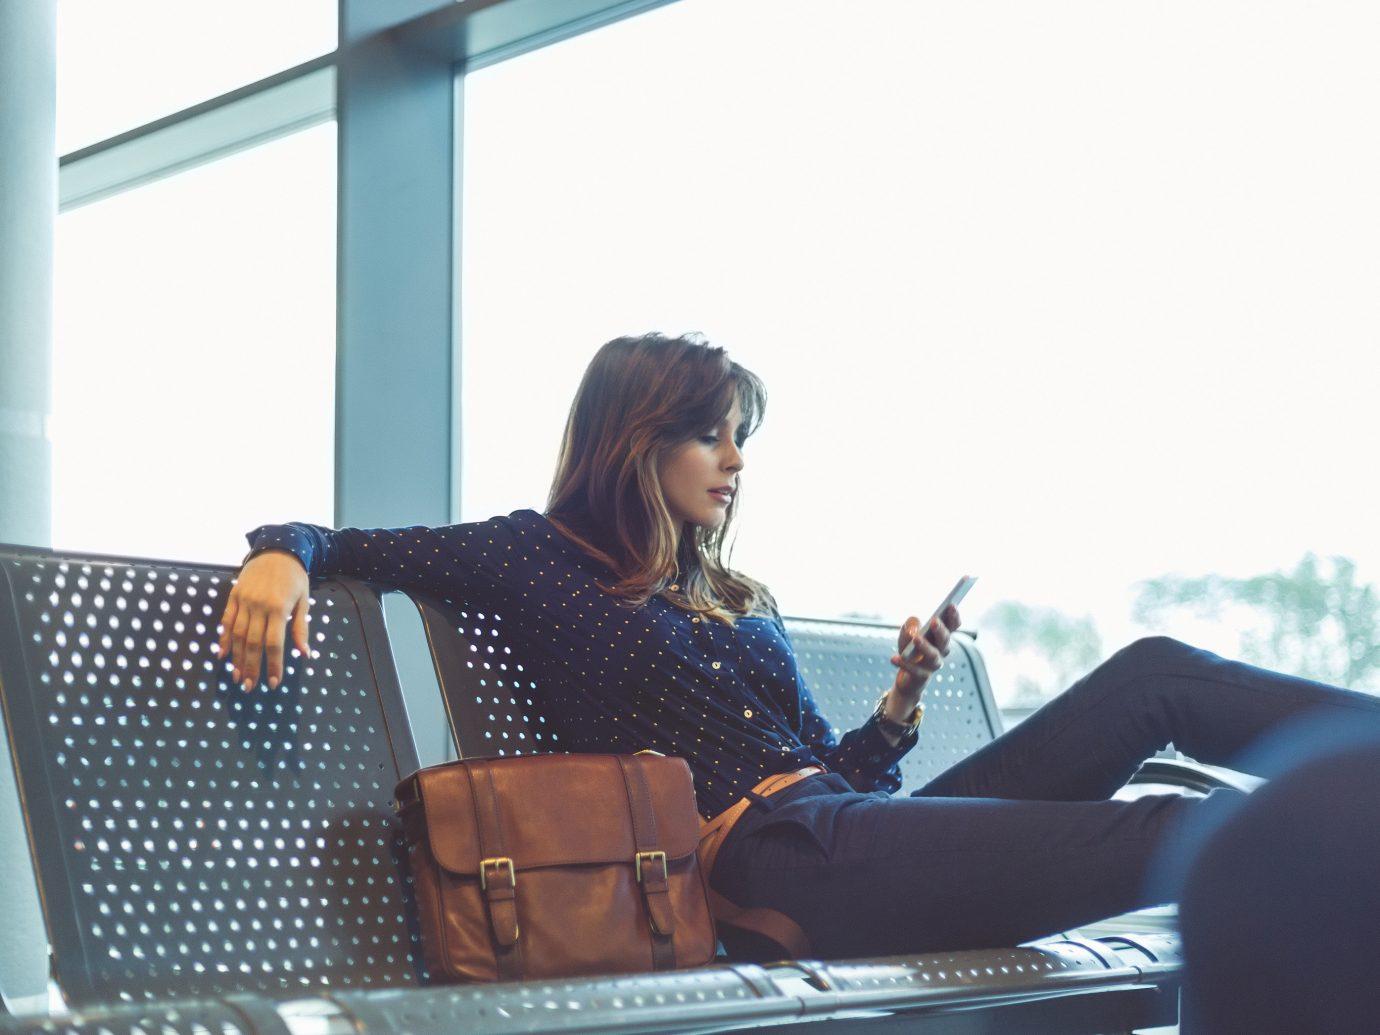 Travel Shop Travel Tips blue sitting woman window person Design girl communication furniture fun